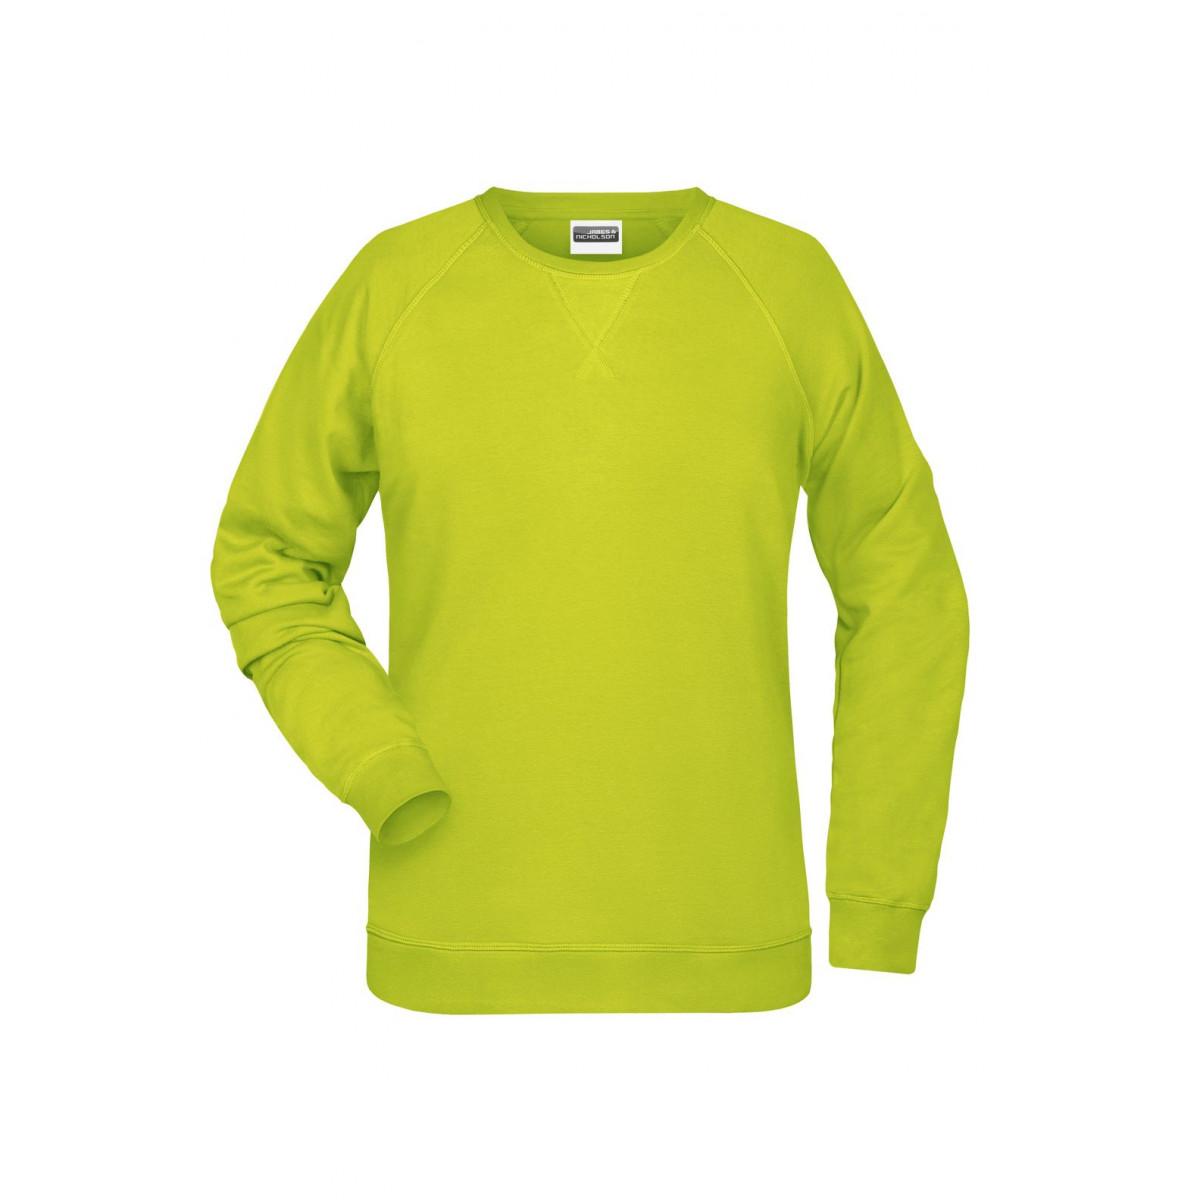 Толстовка женская 8021 Ladies Sweat - Ярко-желтый